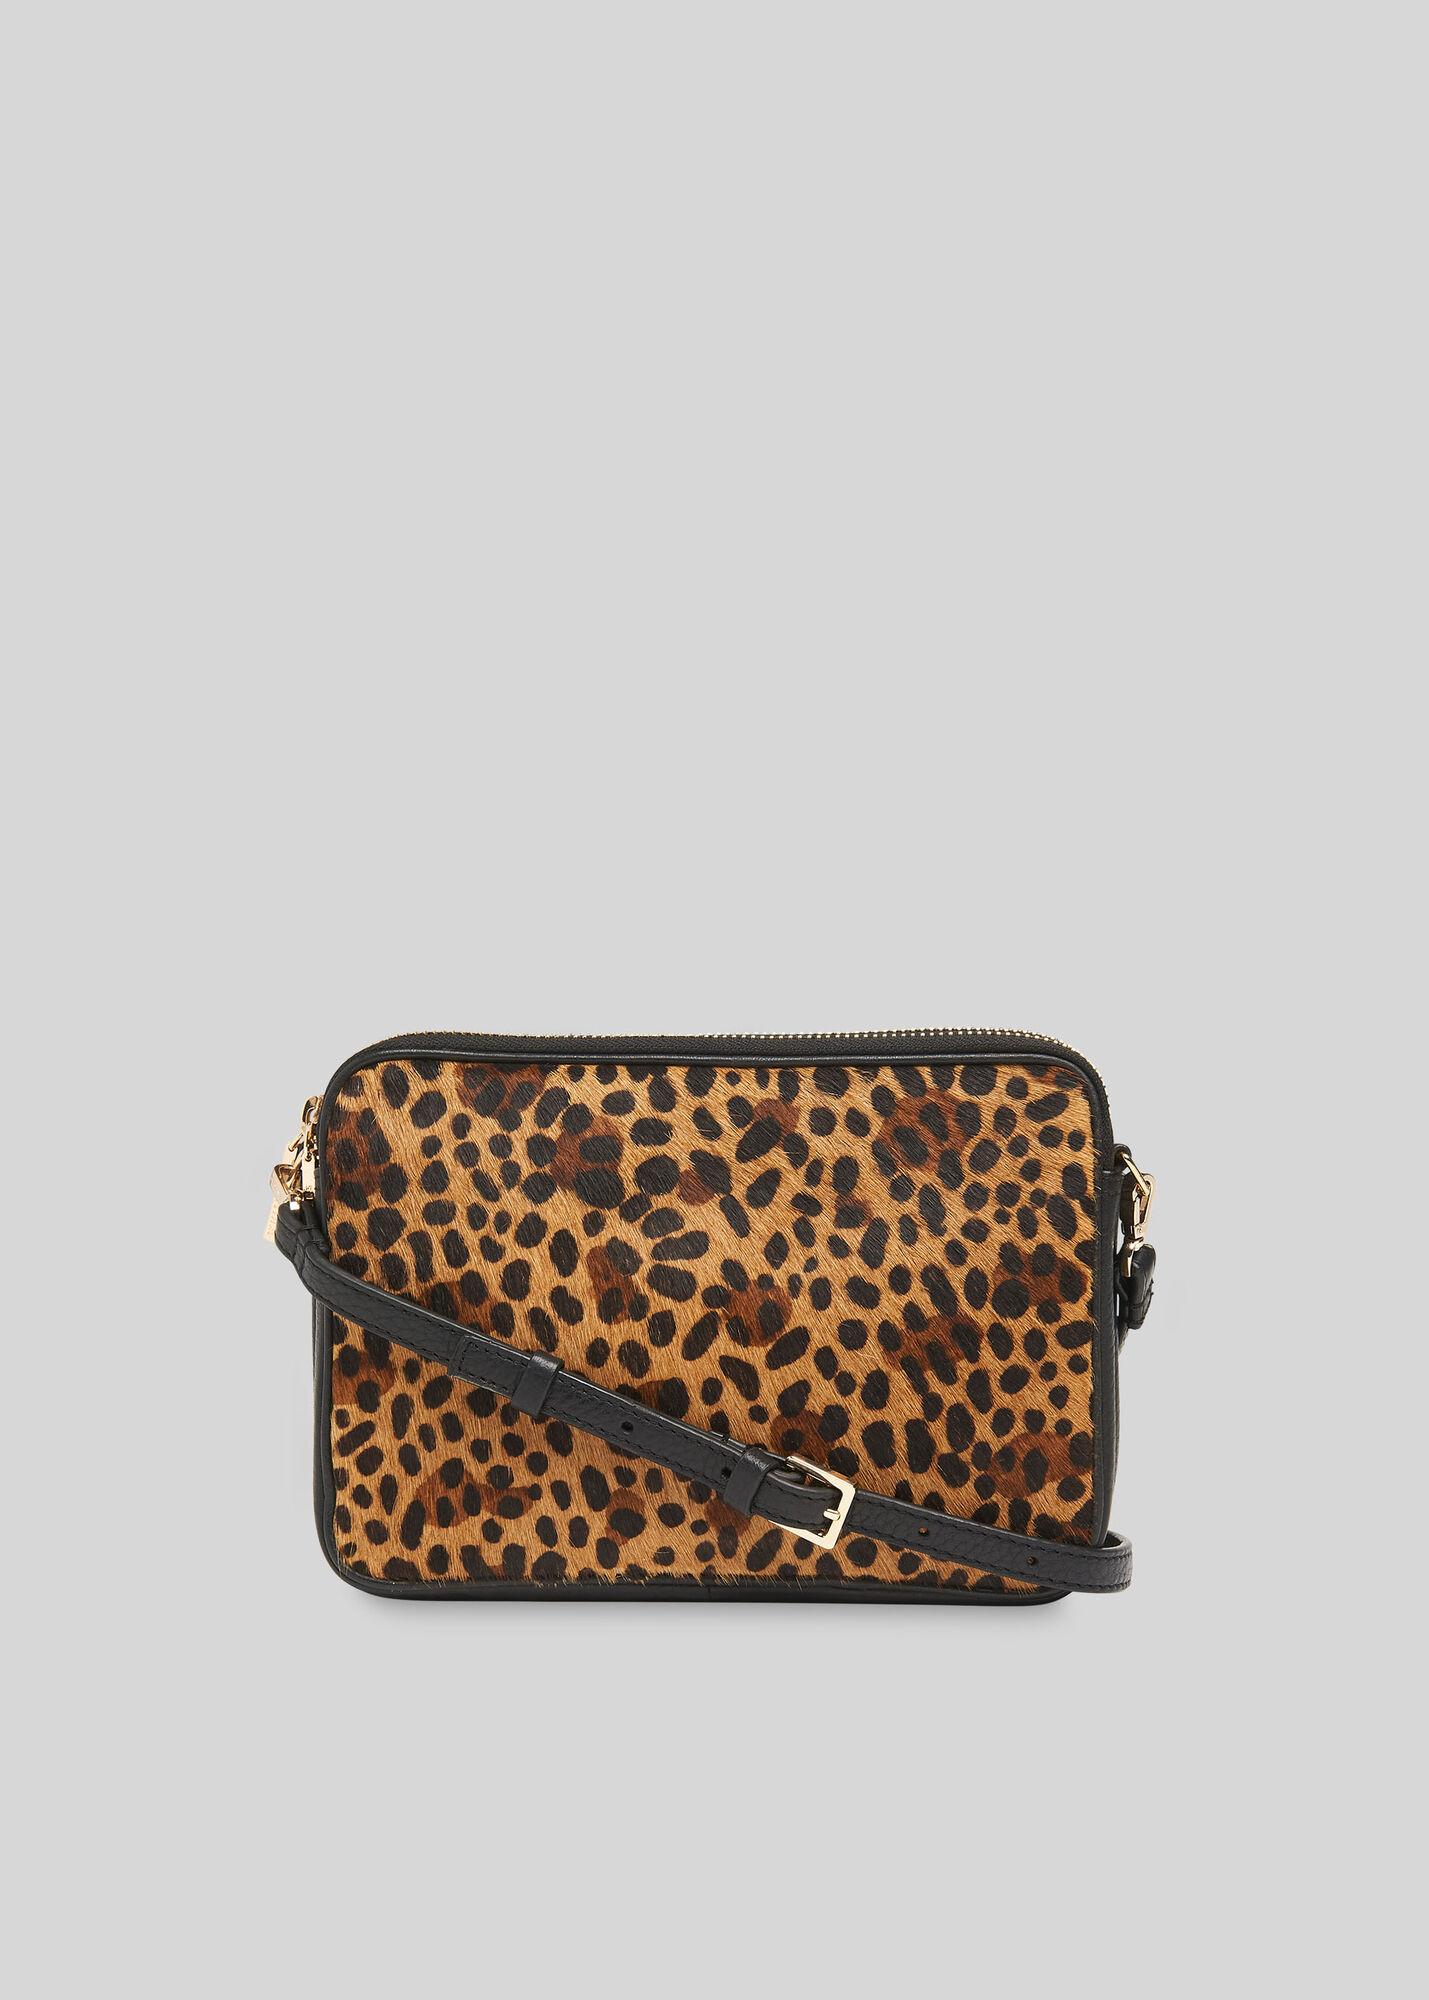 Cami Crossbody Bag